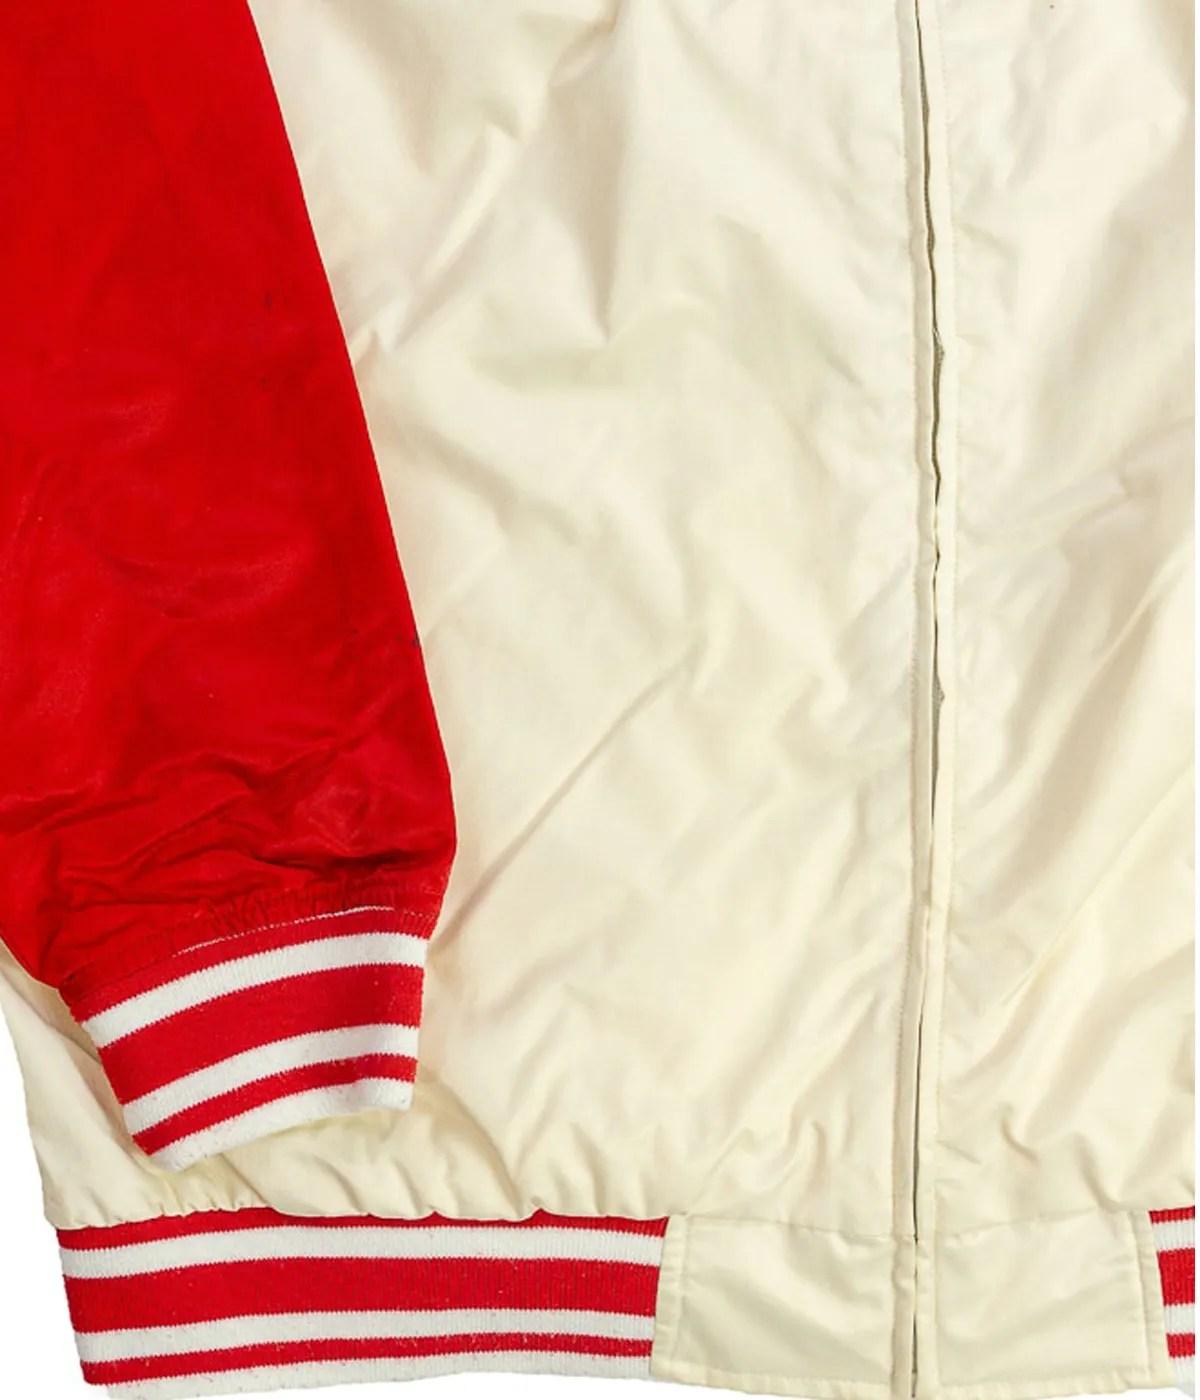 formula-fifty-g-unit-varsity-jacket